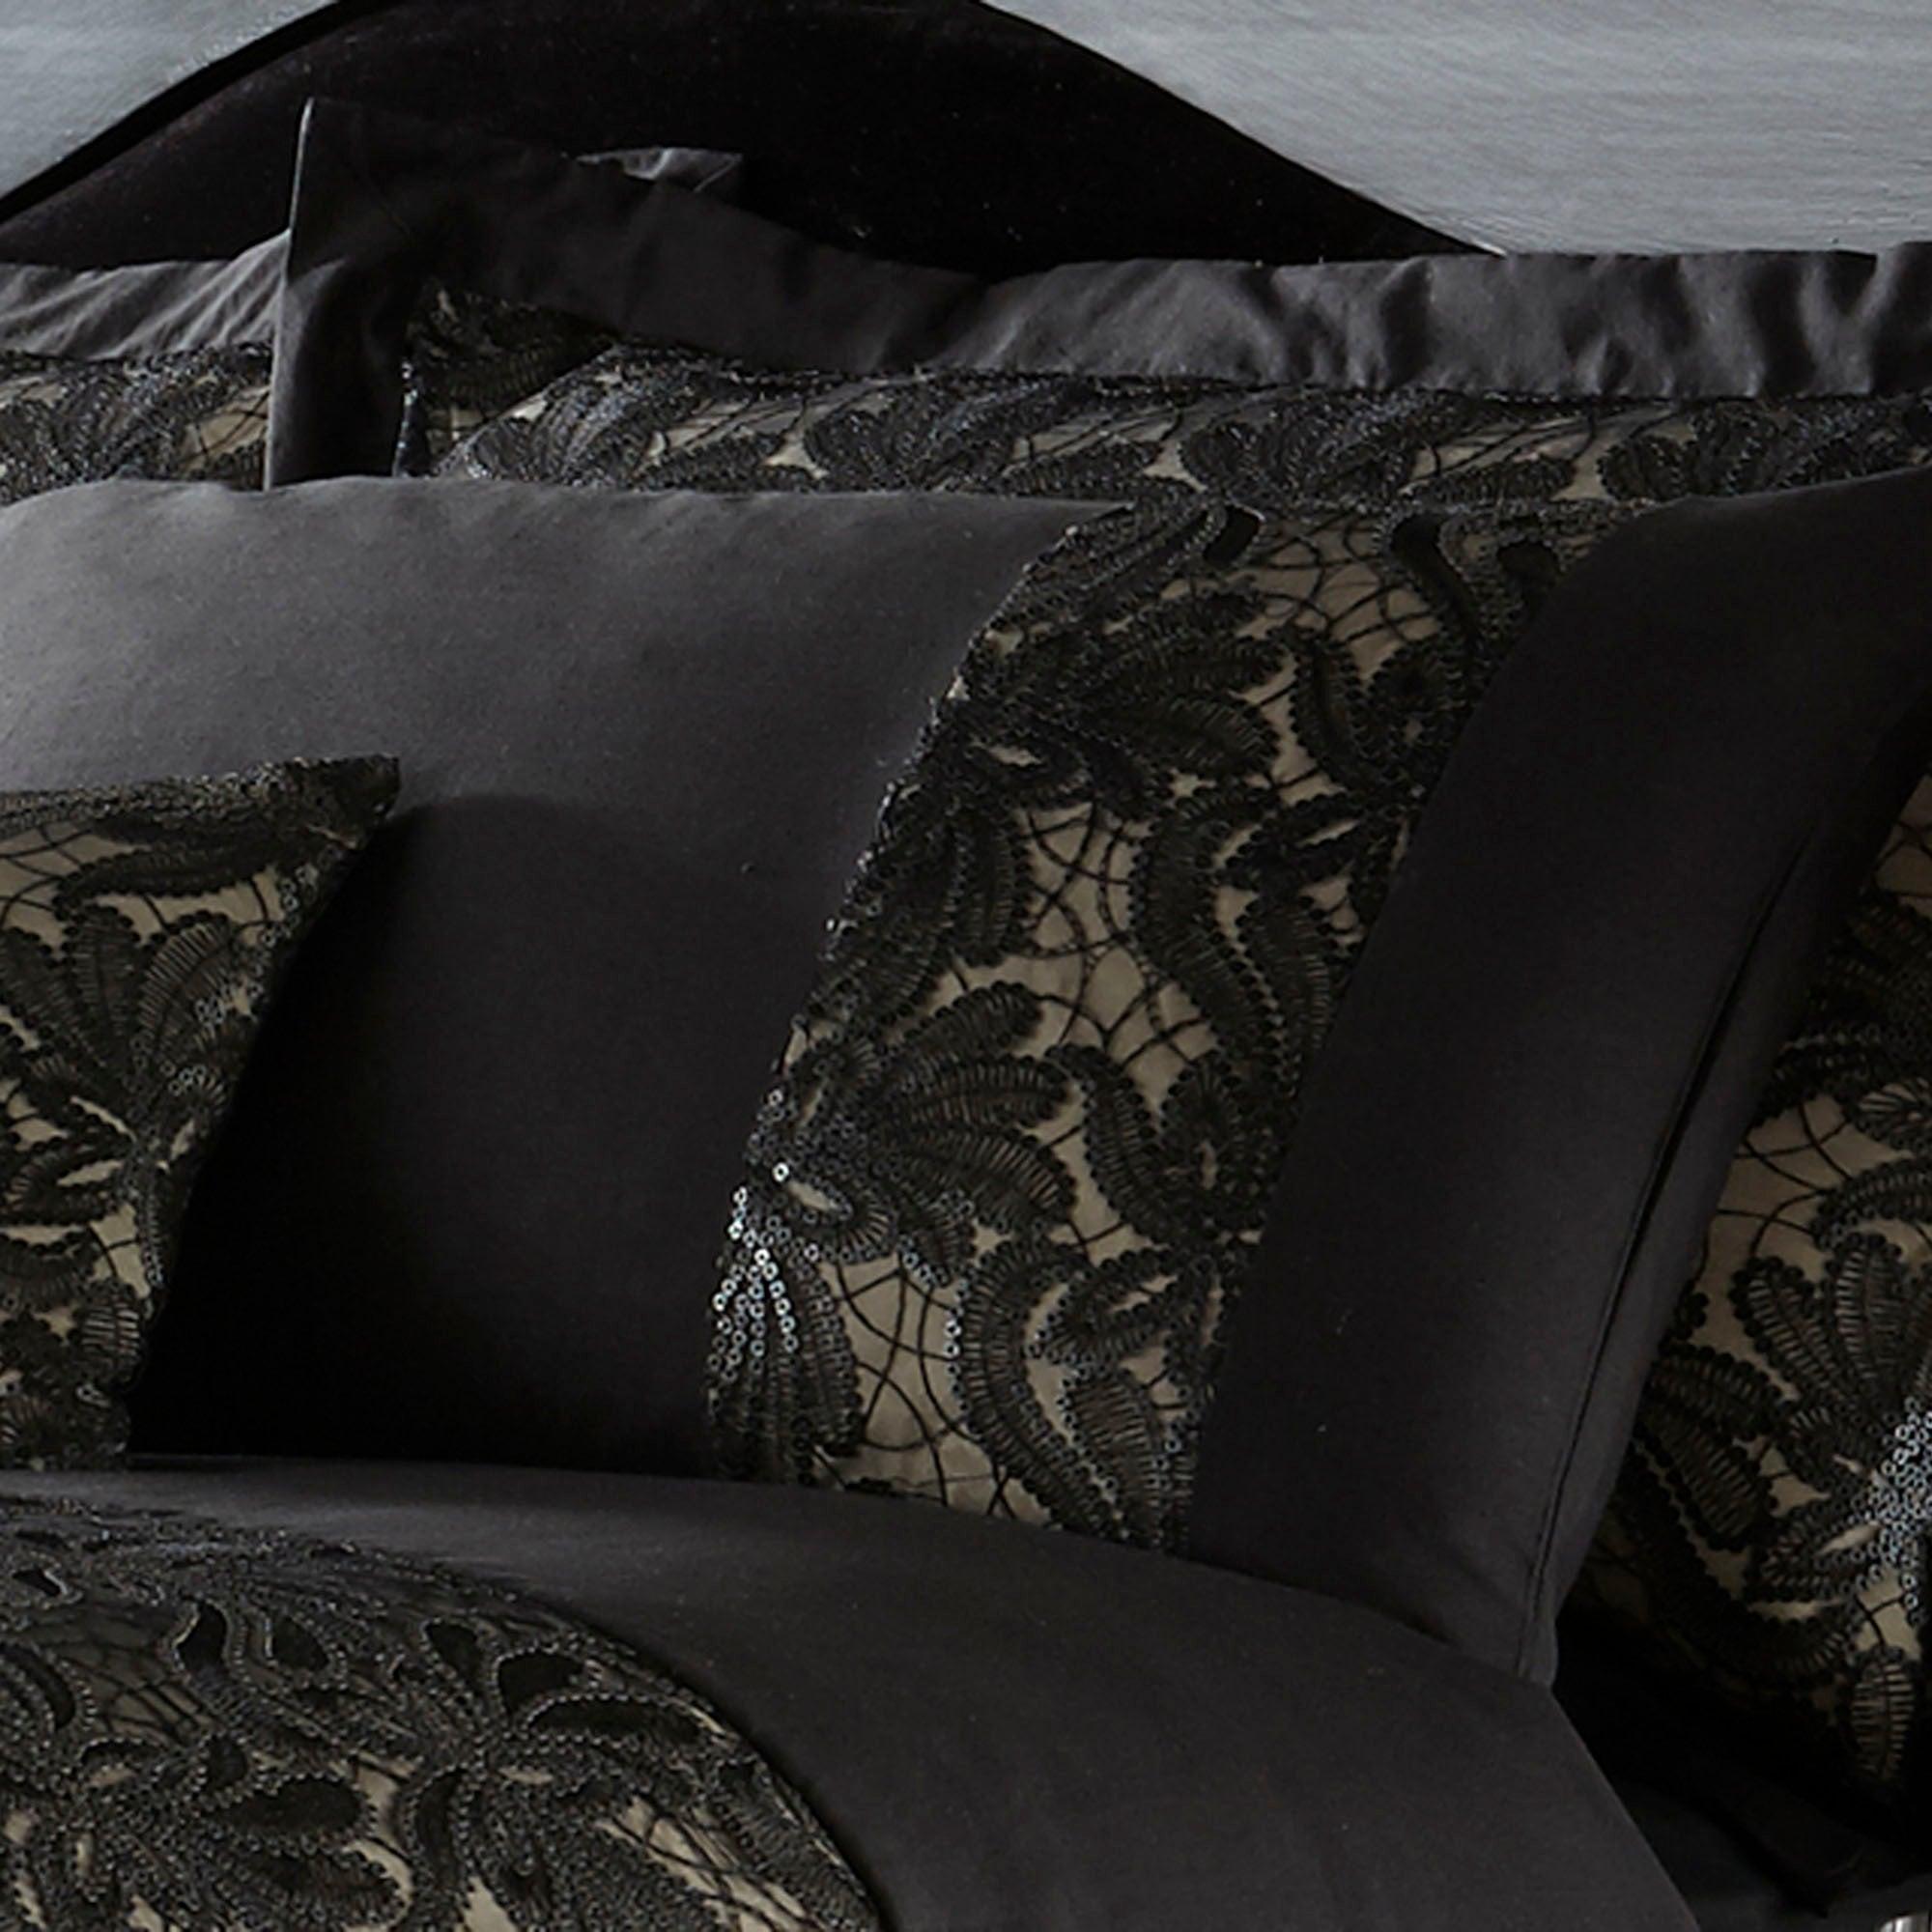 Black Zetta Collection Housewife Pillowcase